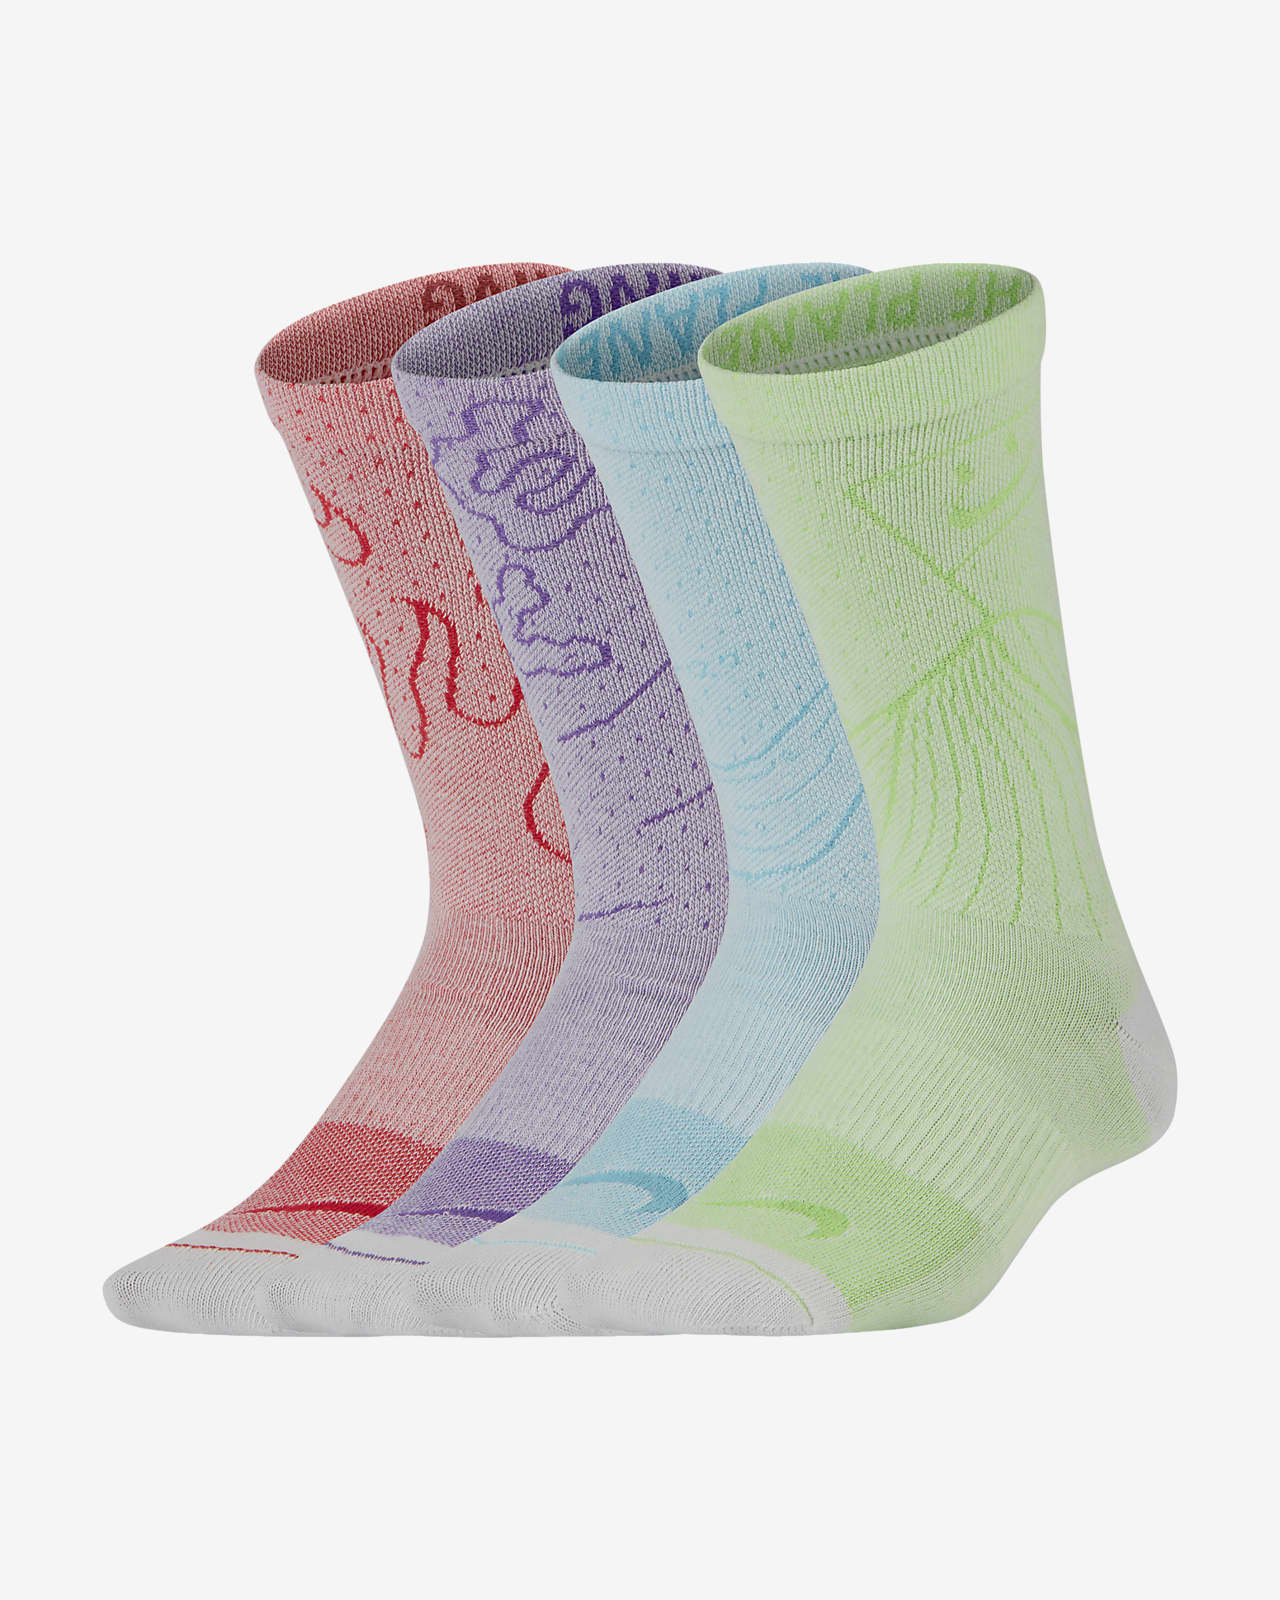 Nike Swoosh Lightweight Older Kids' Crew Socks (2 Pairs)